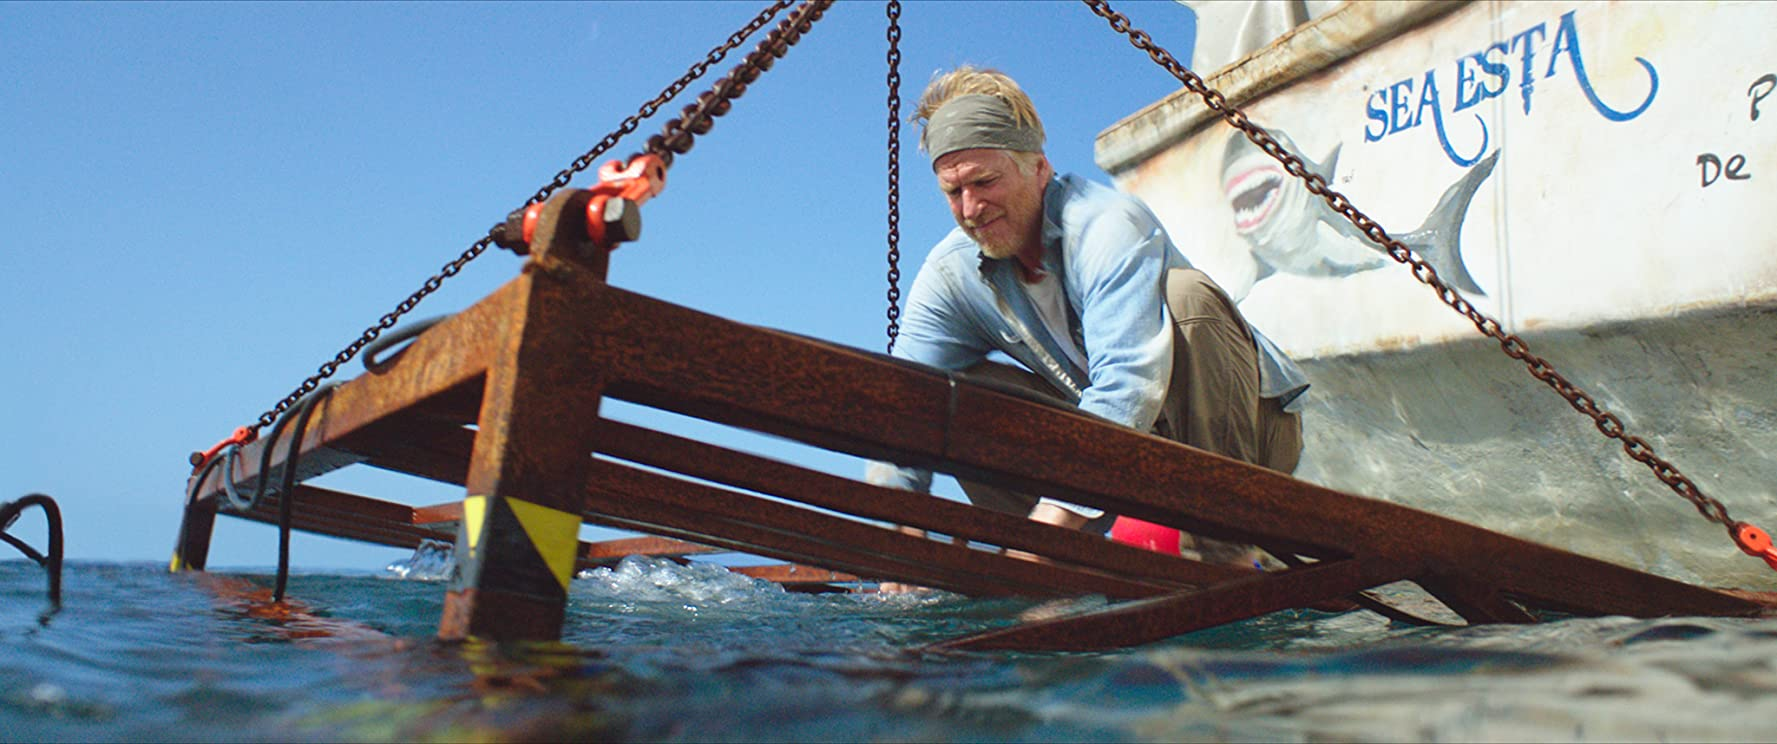 Matthew Modine in 47 Meters Down (2017)